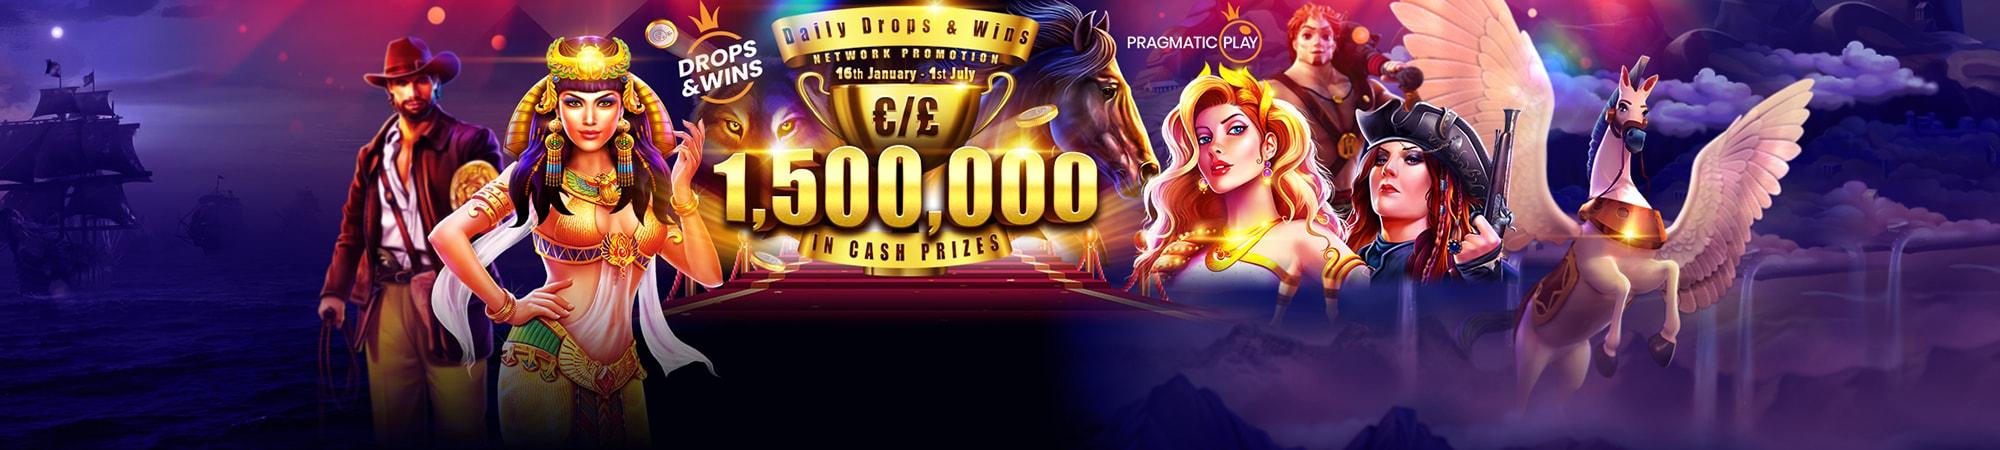 ArgoCasino daylidrops and wins 1500000